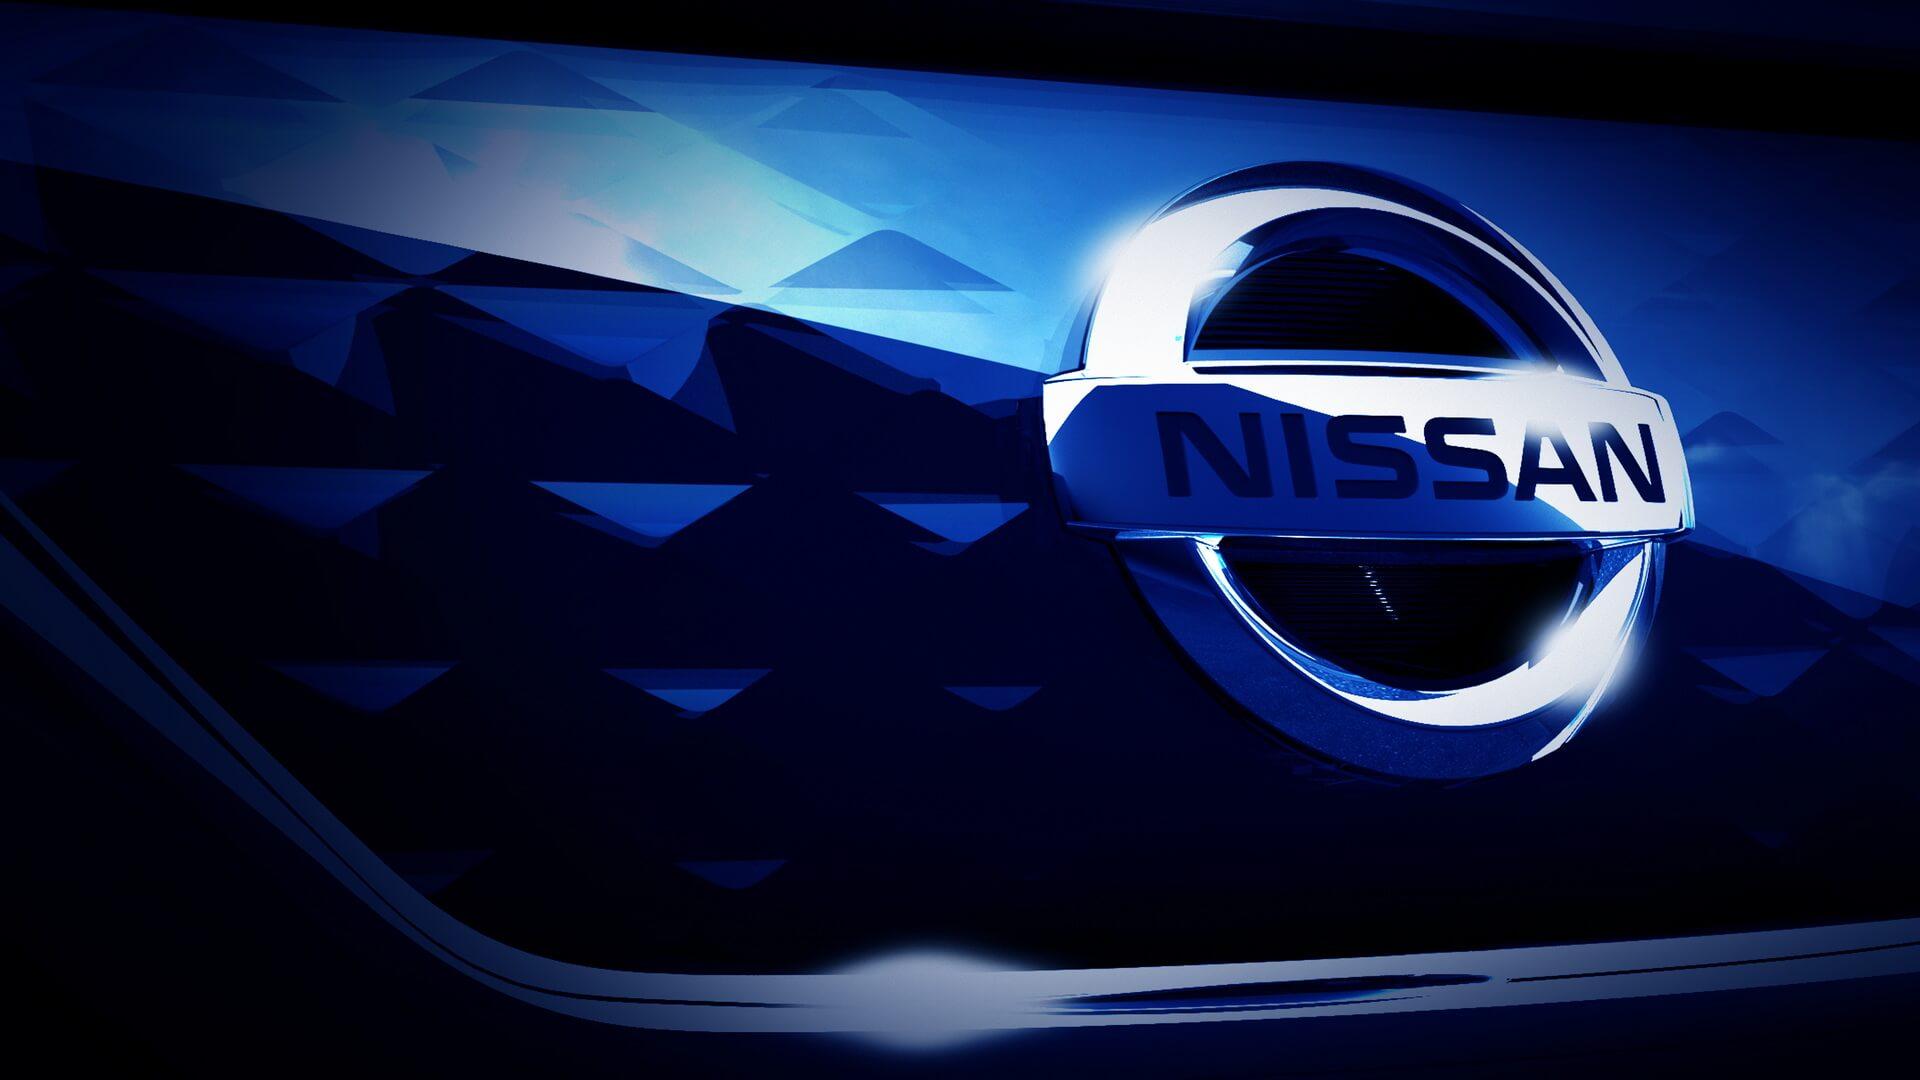 Фото значка бренда иребристой передней части бампера Nissan Leaf 2018